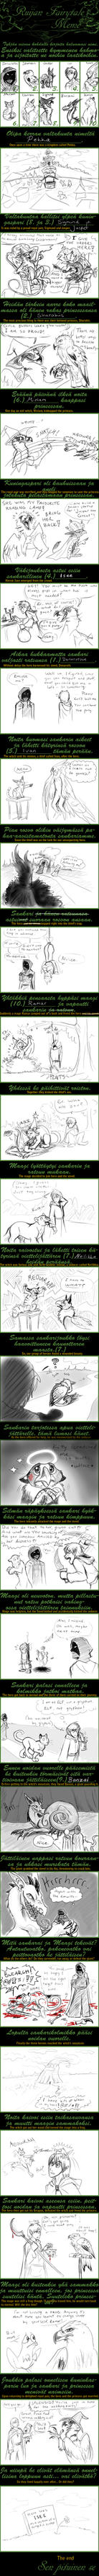 Fairytale-meme English version by dorini